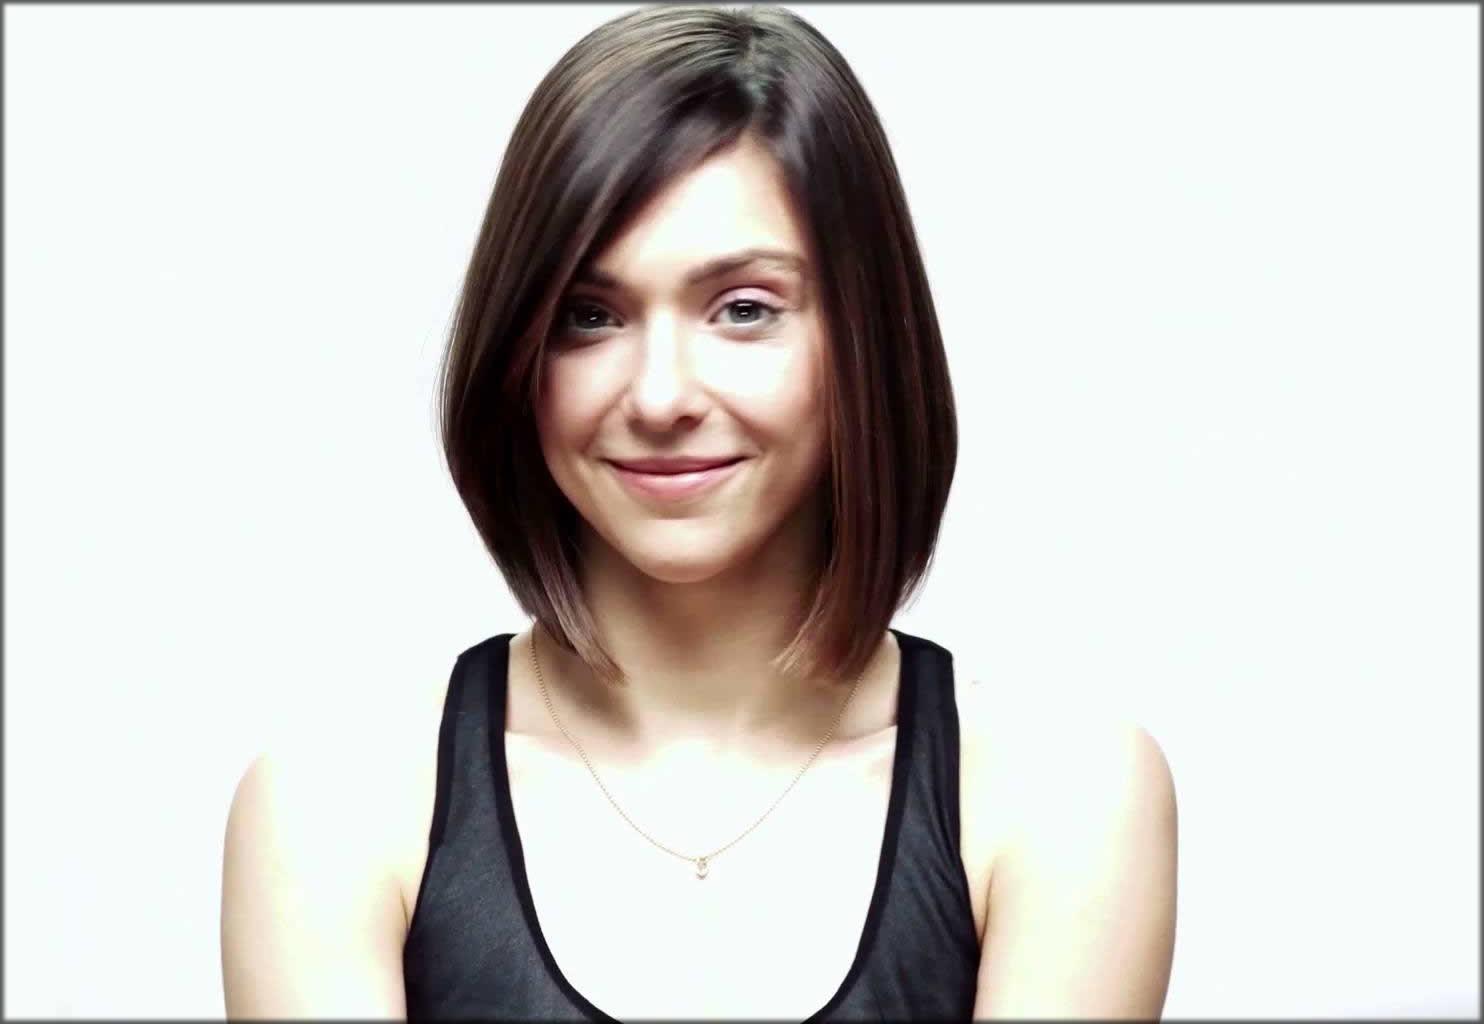 Stylish Haircut For Girls